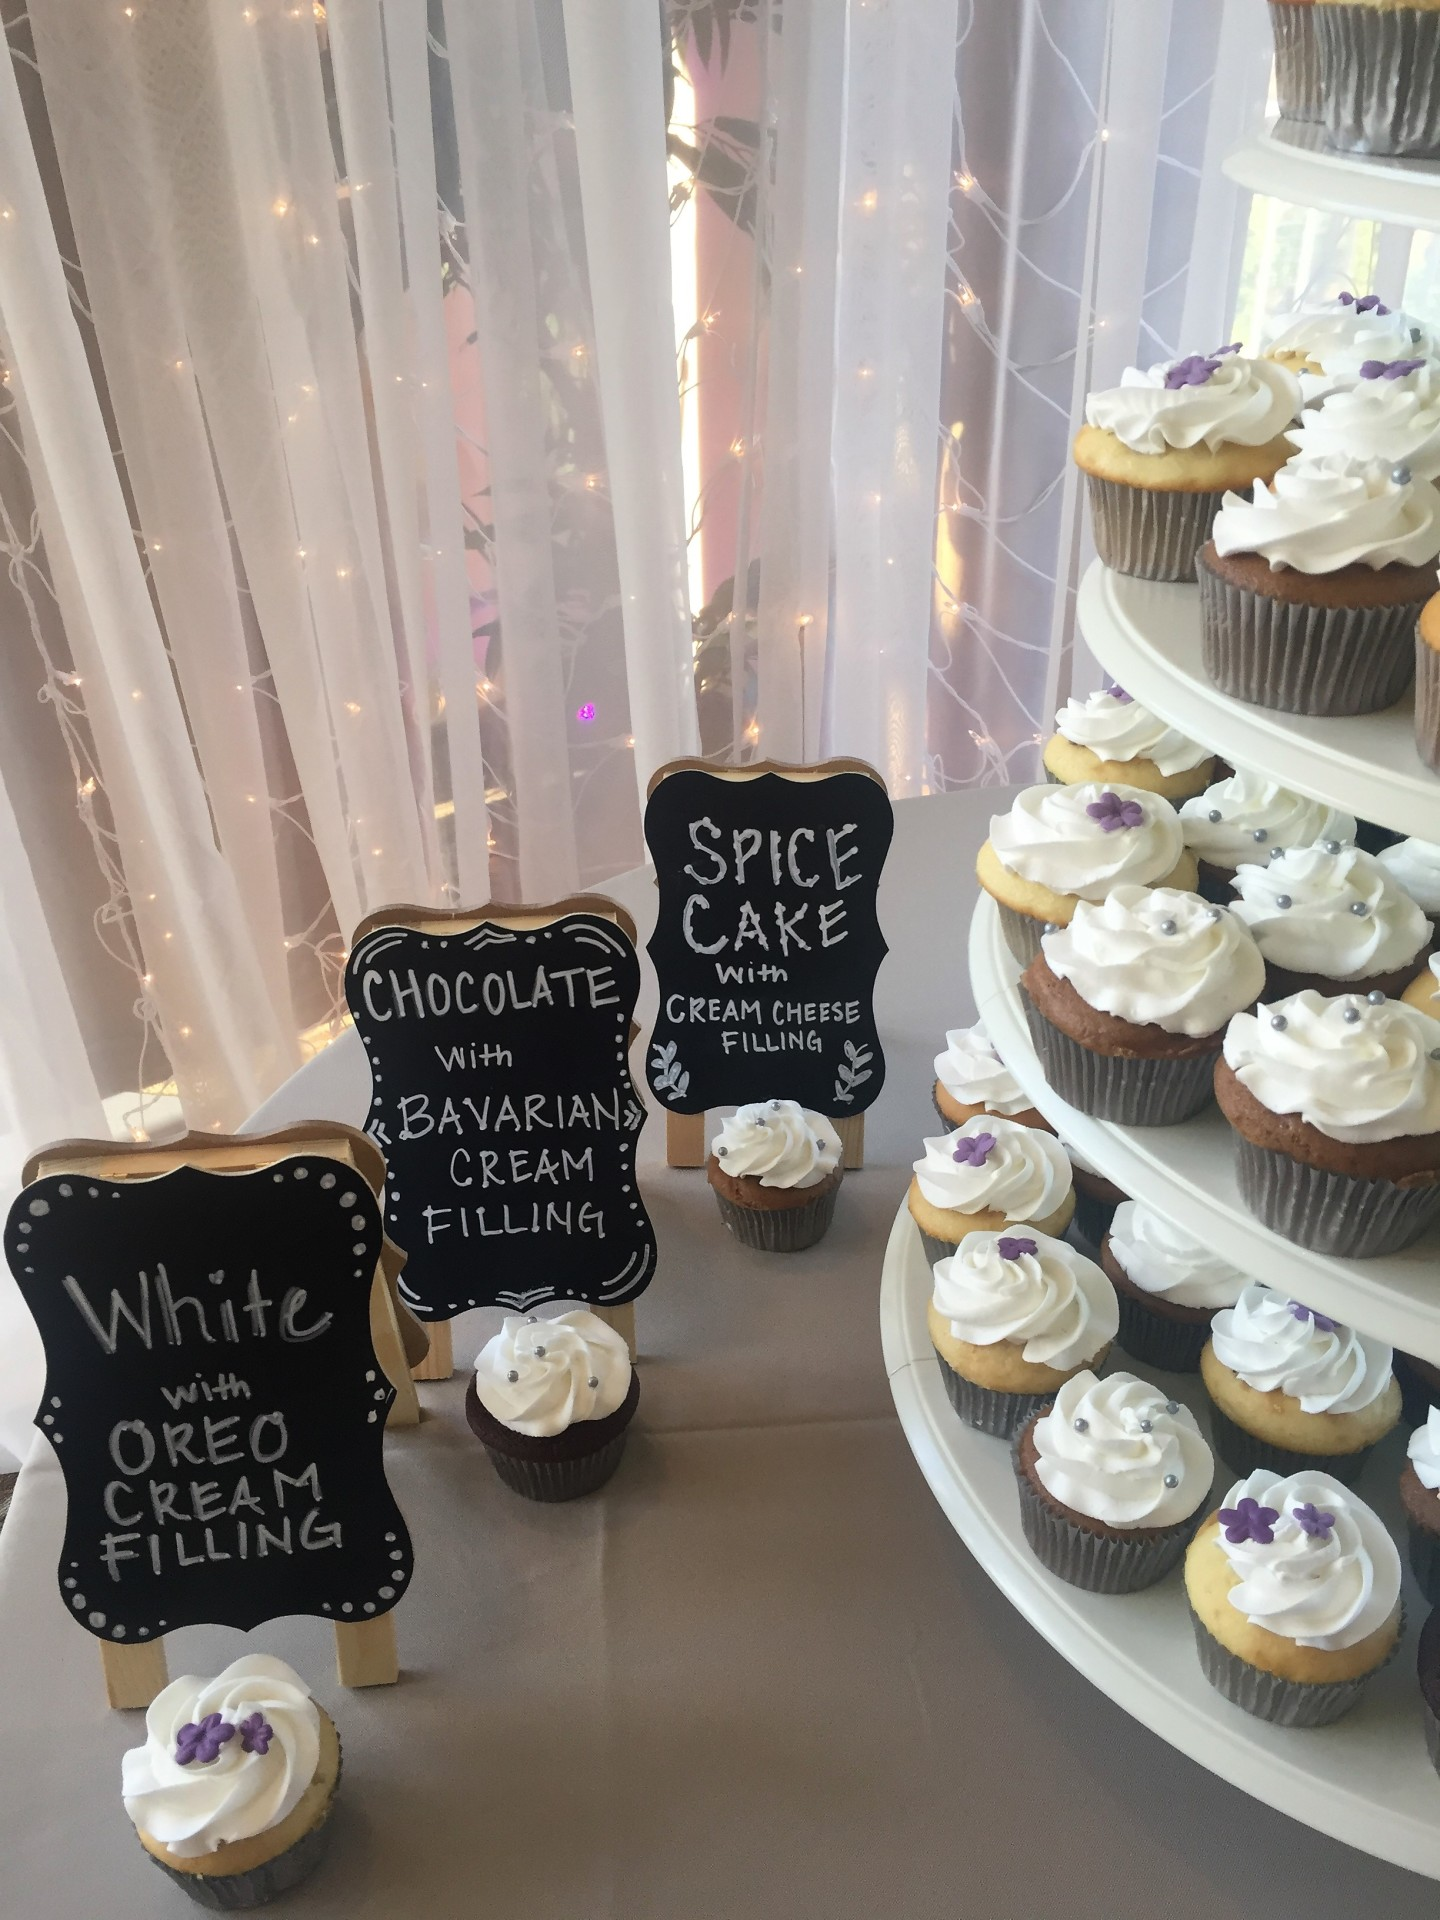 Cute cupcake signs